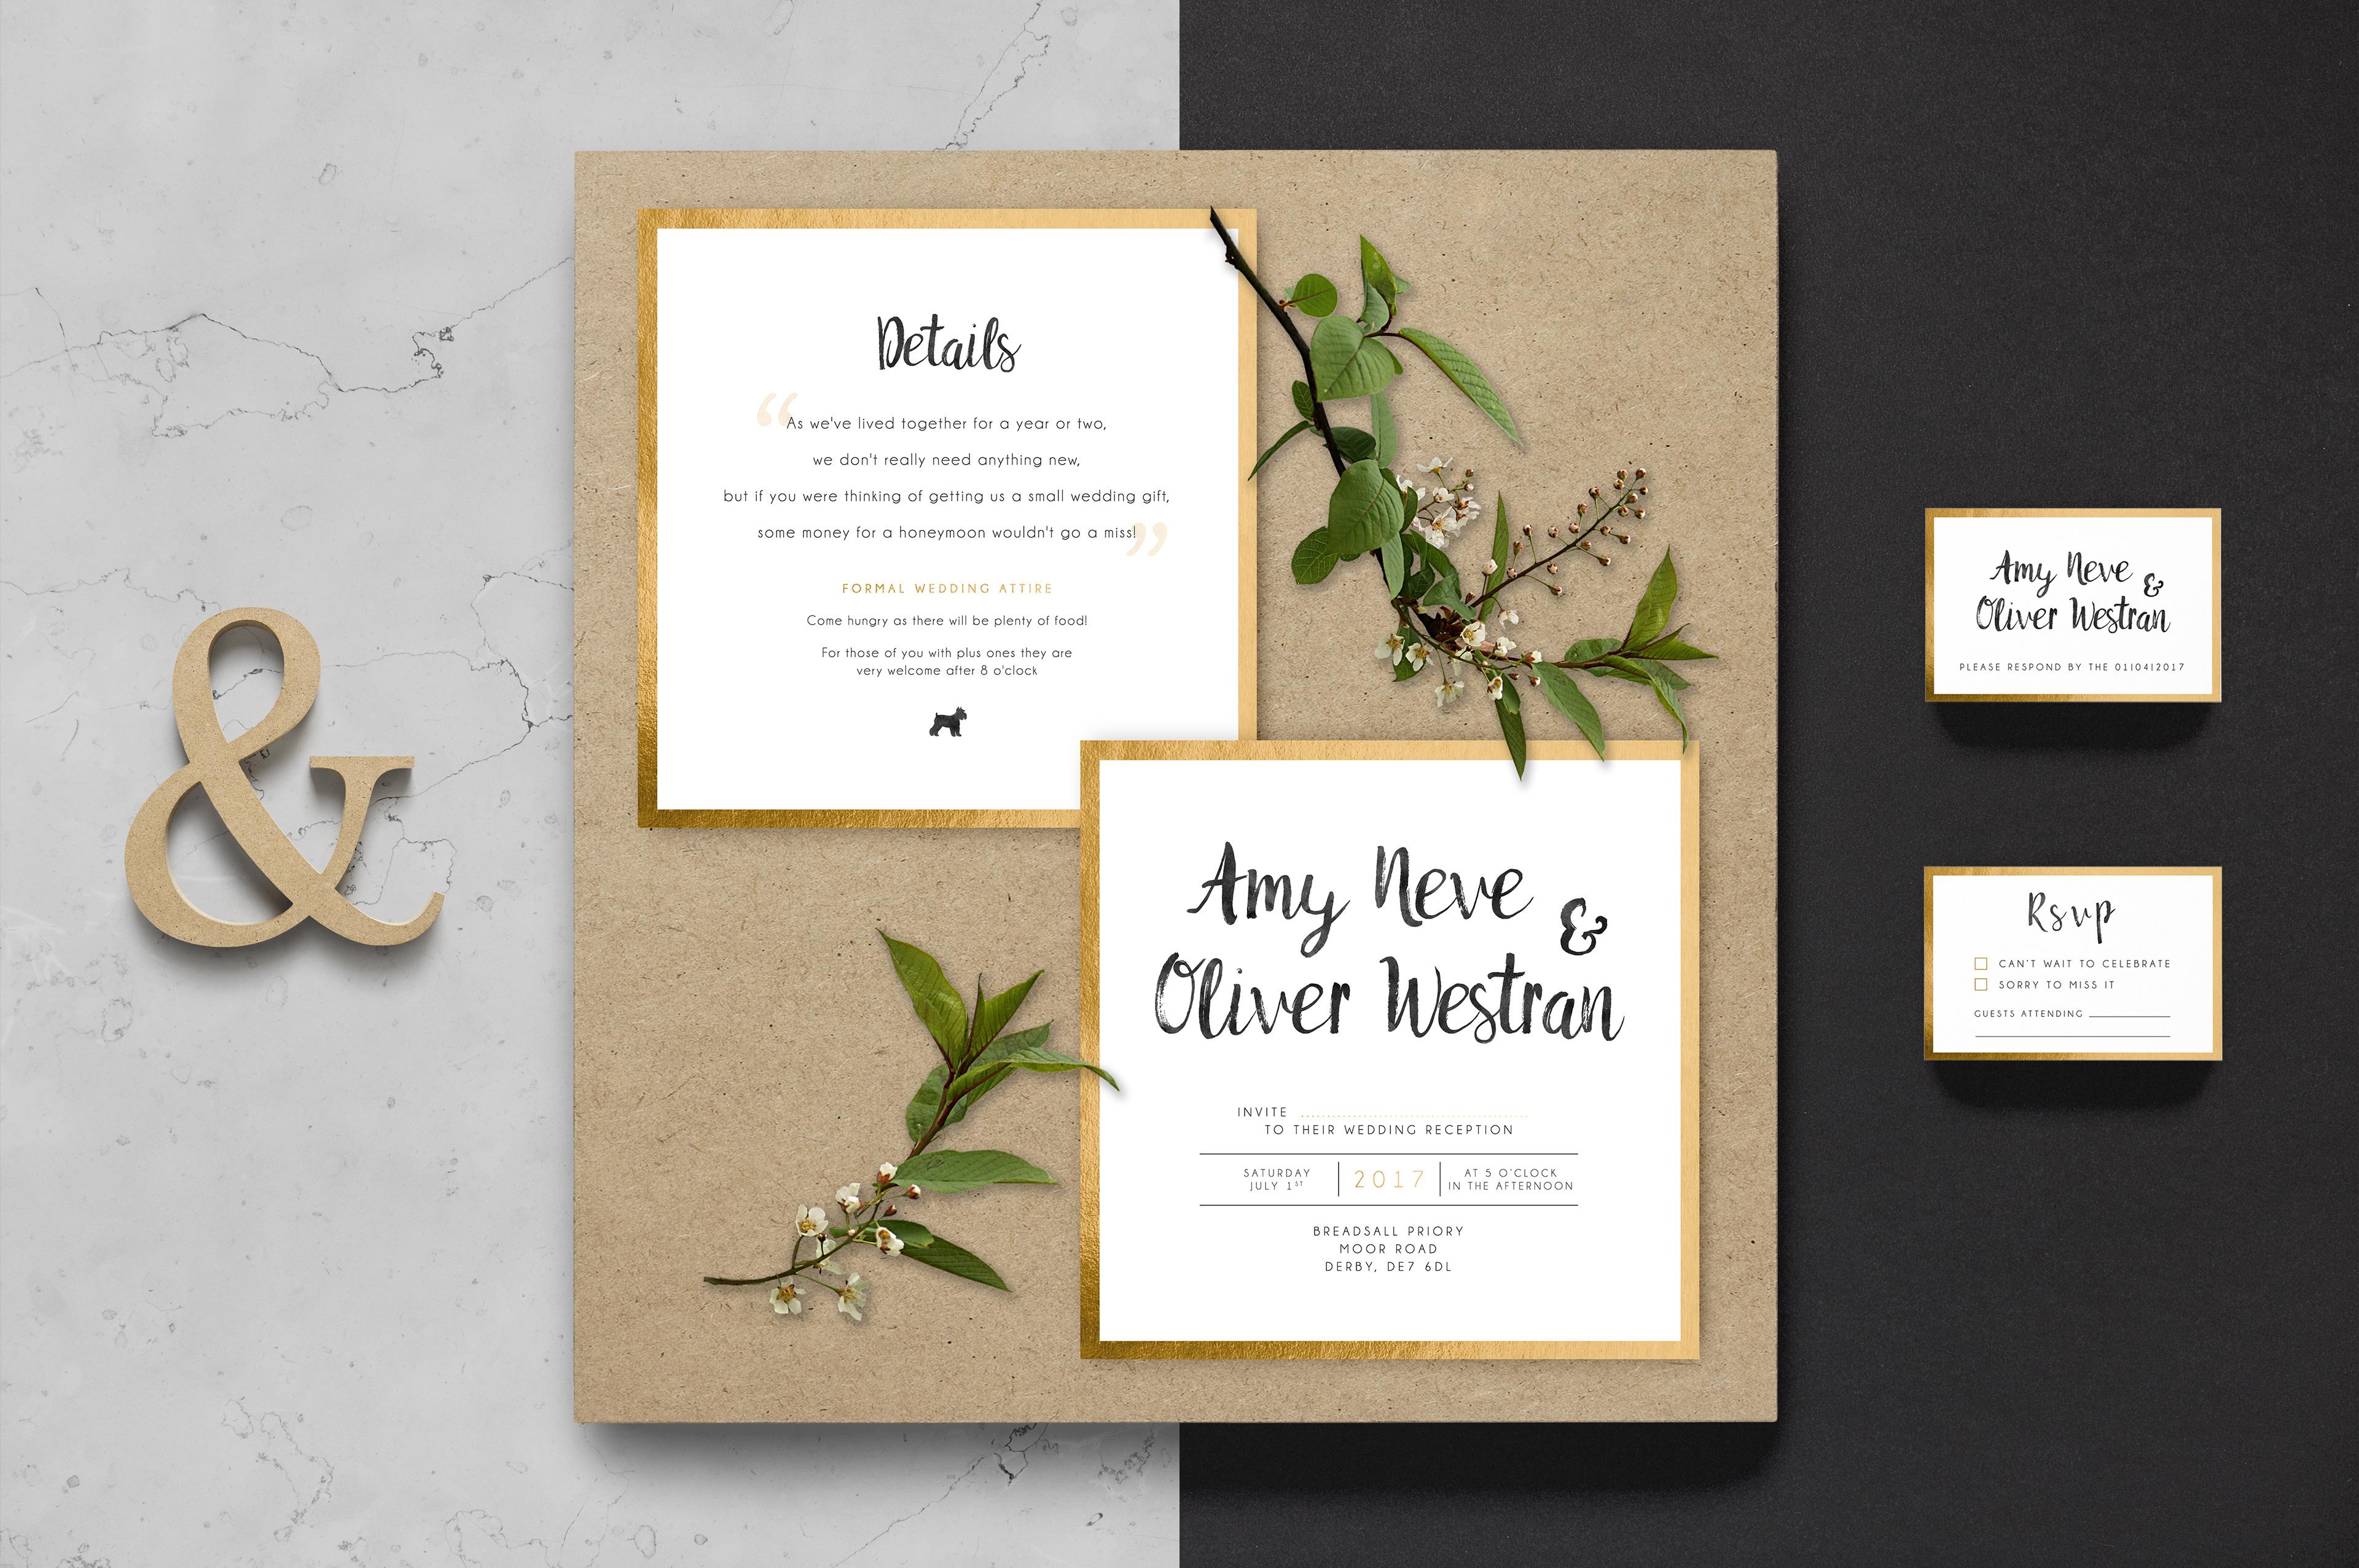 Emily Neve - Wedding Invitations